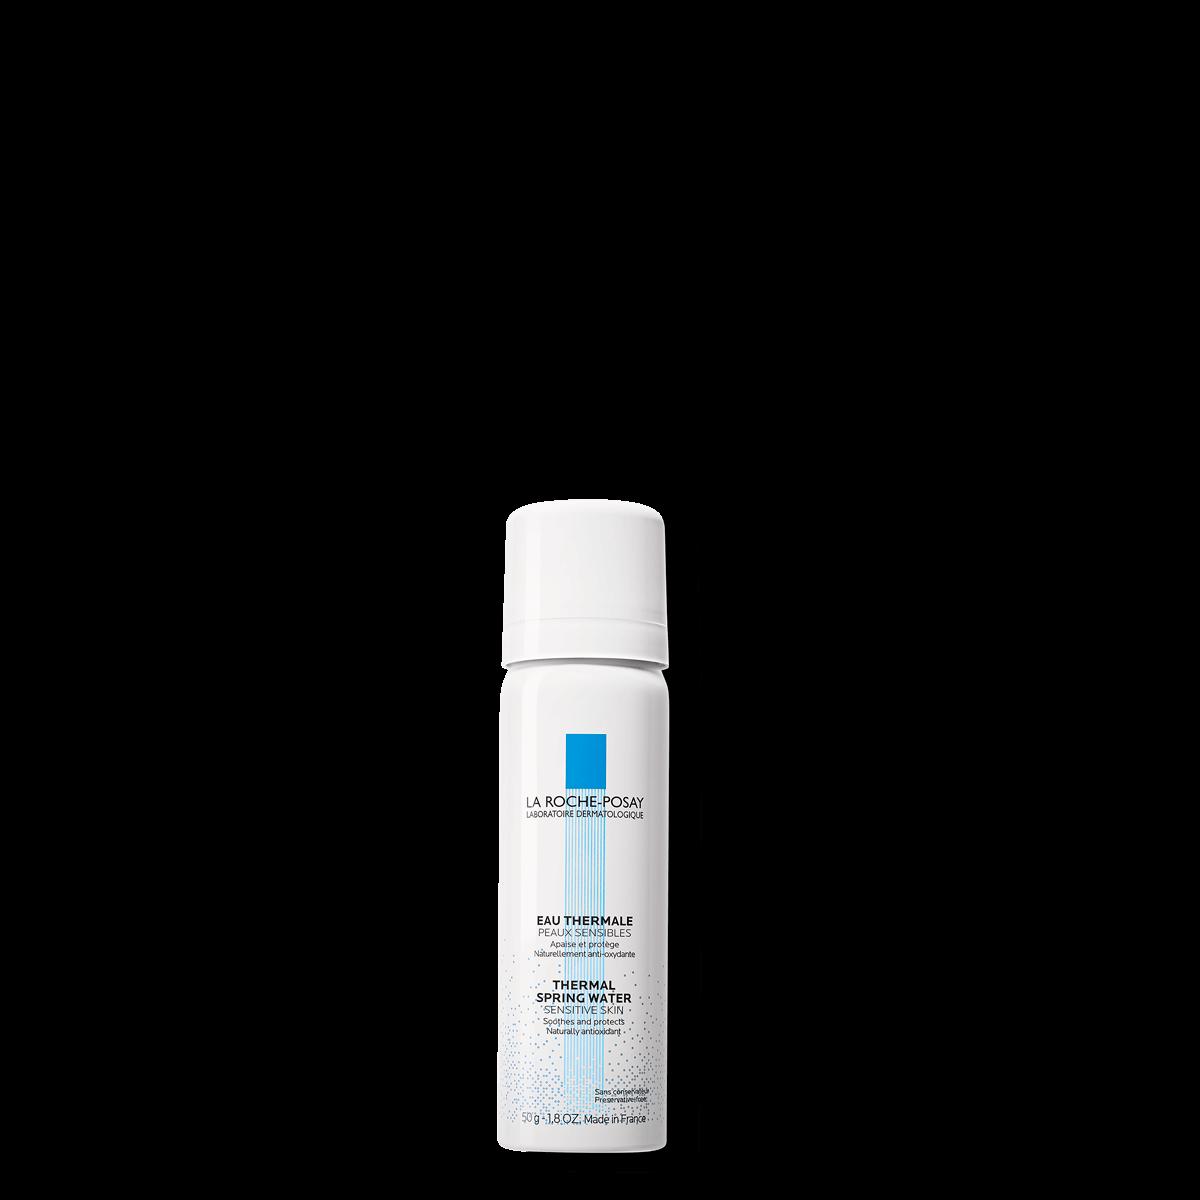 La Roche Posay Produktsida Thermal Spring Water 50ml 3433422403765